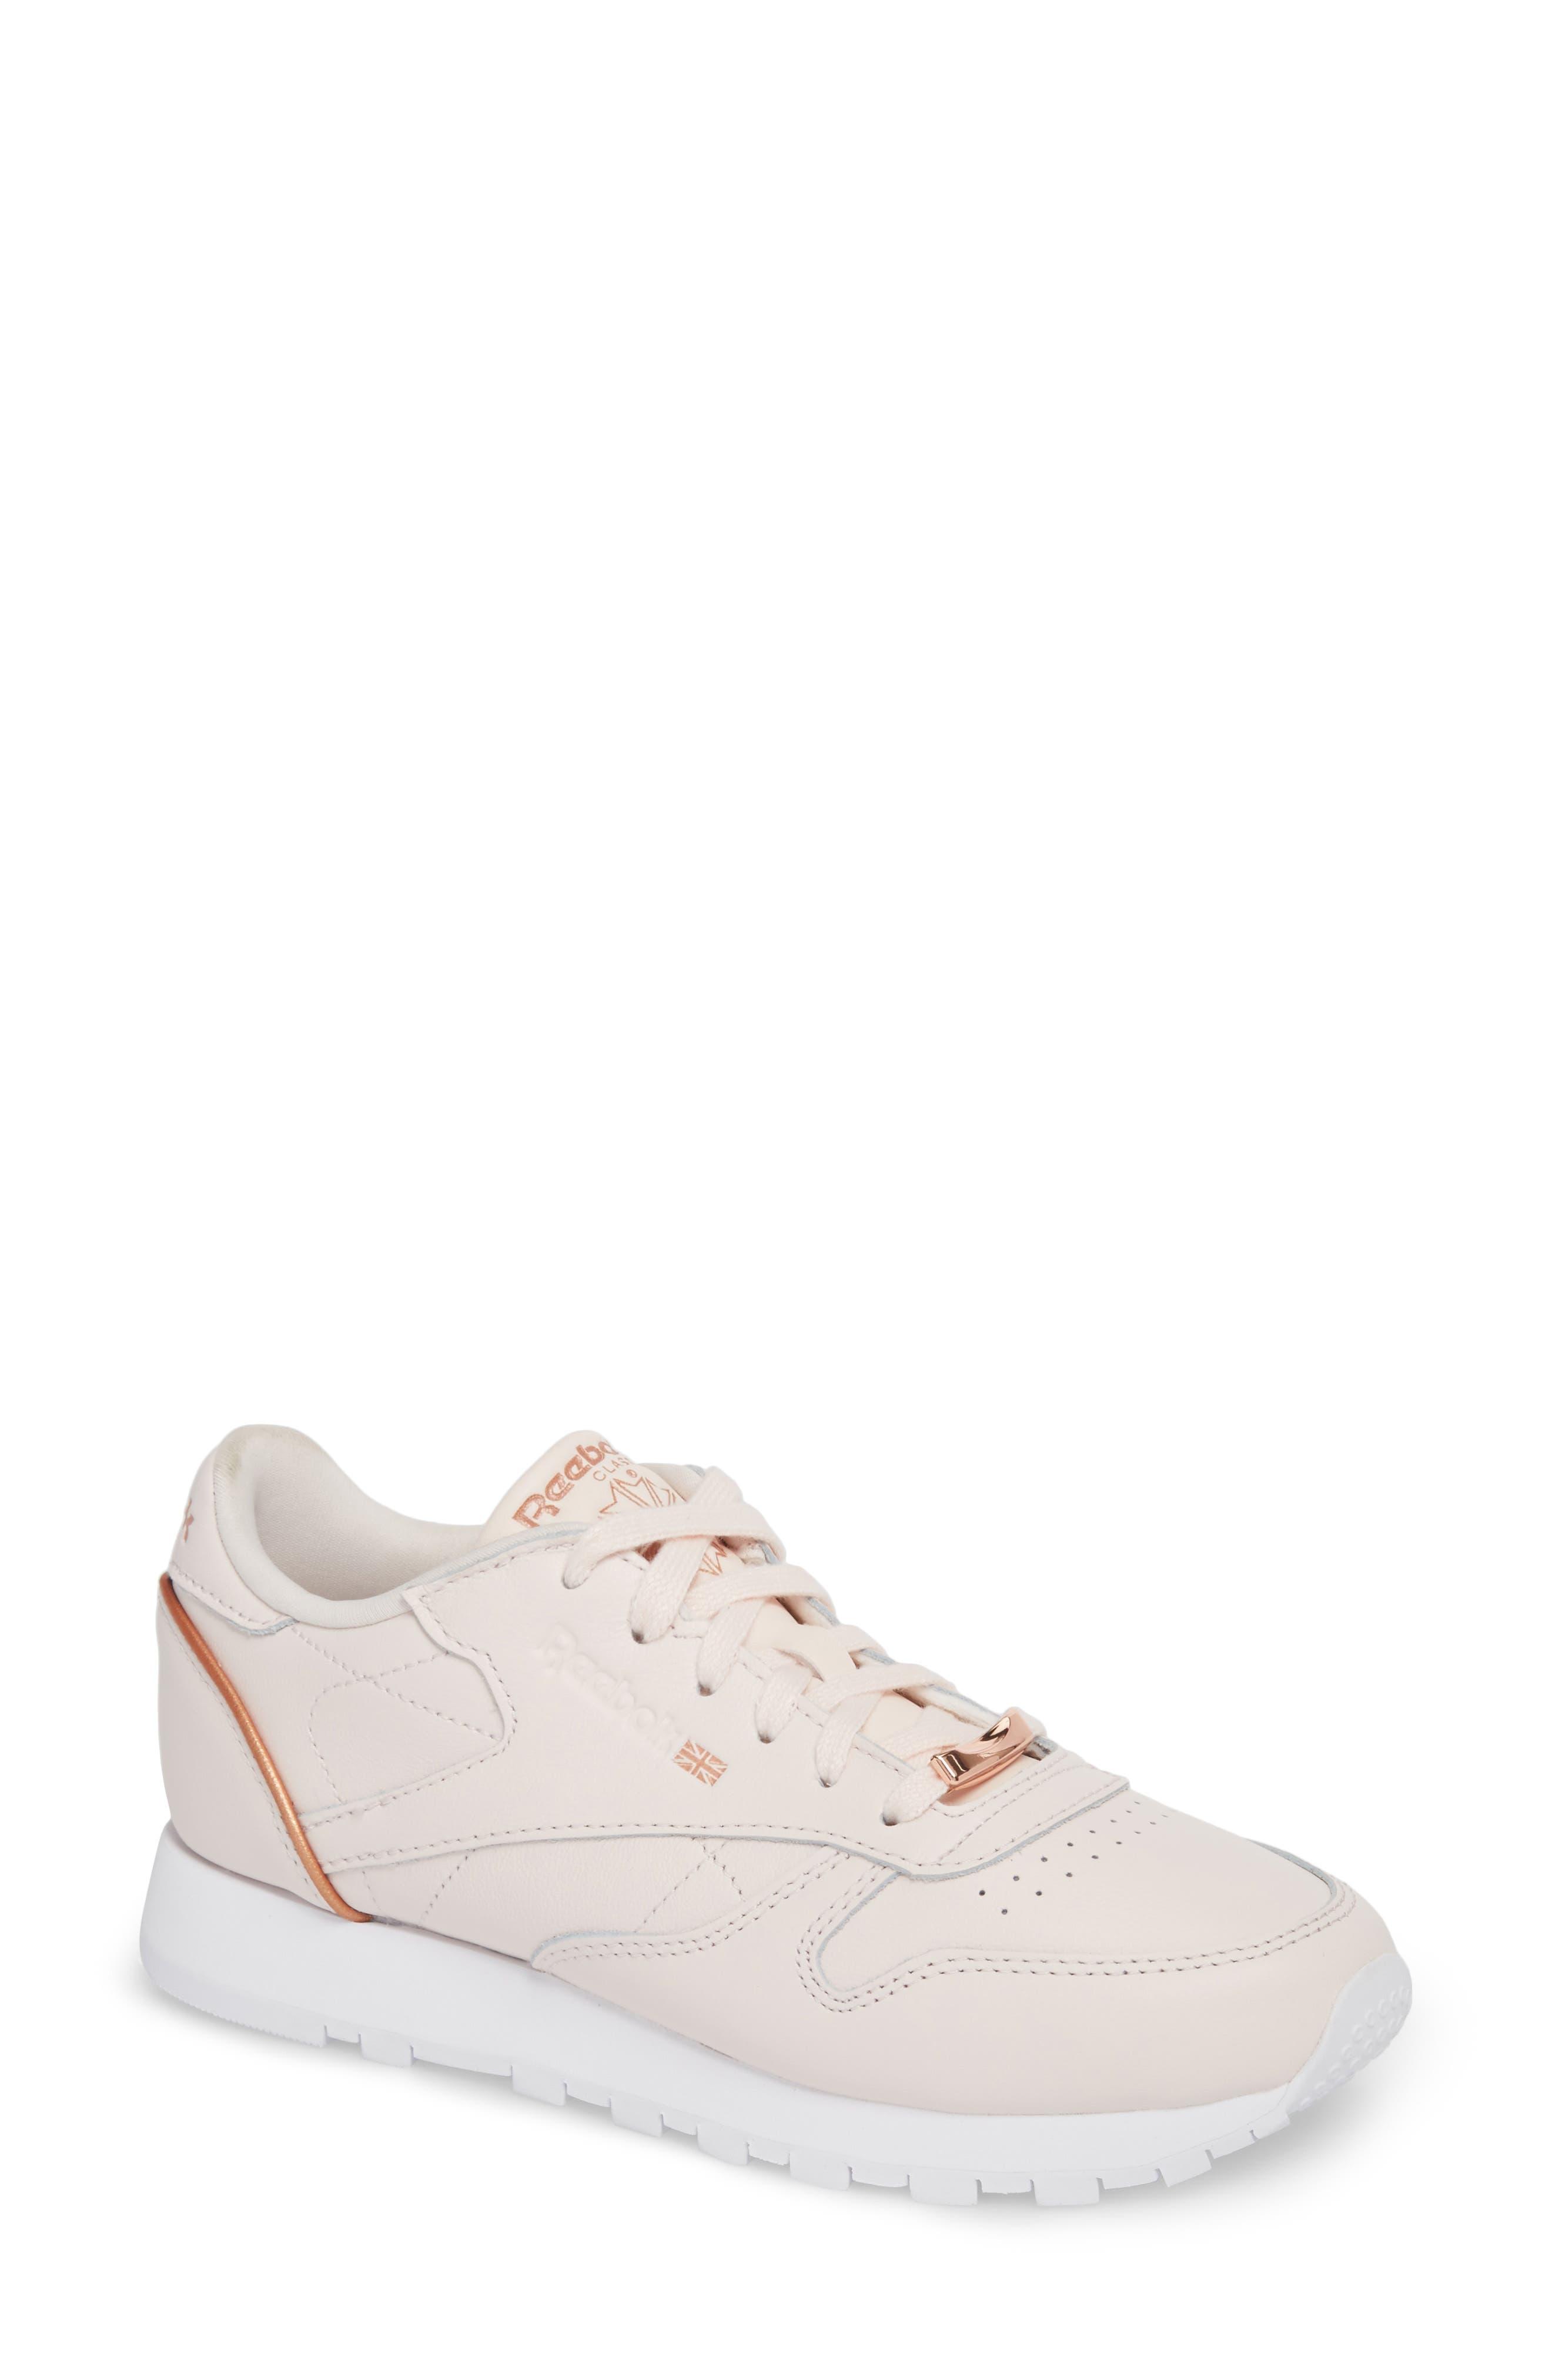 Alternate Image 1 Selected - Reebok Classic Leather HW Sneaker (Women)